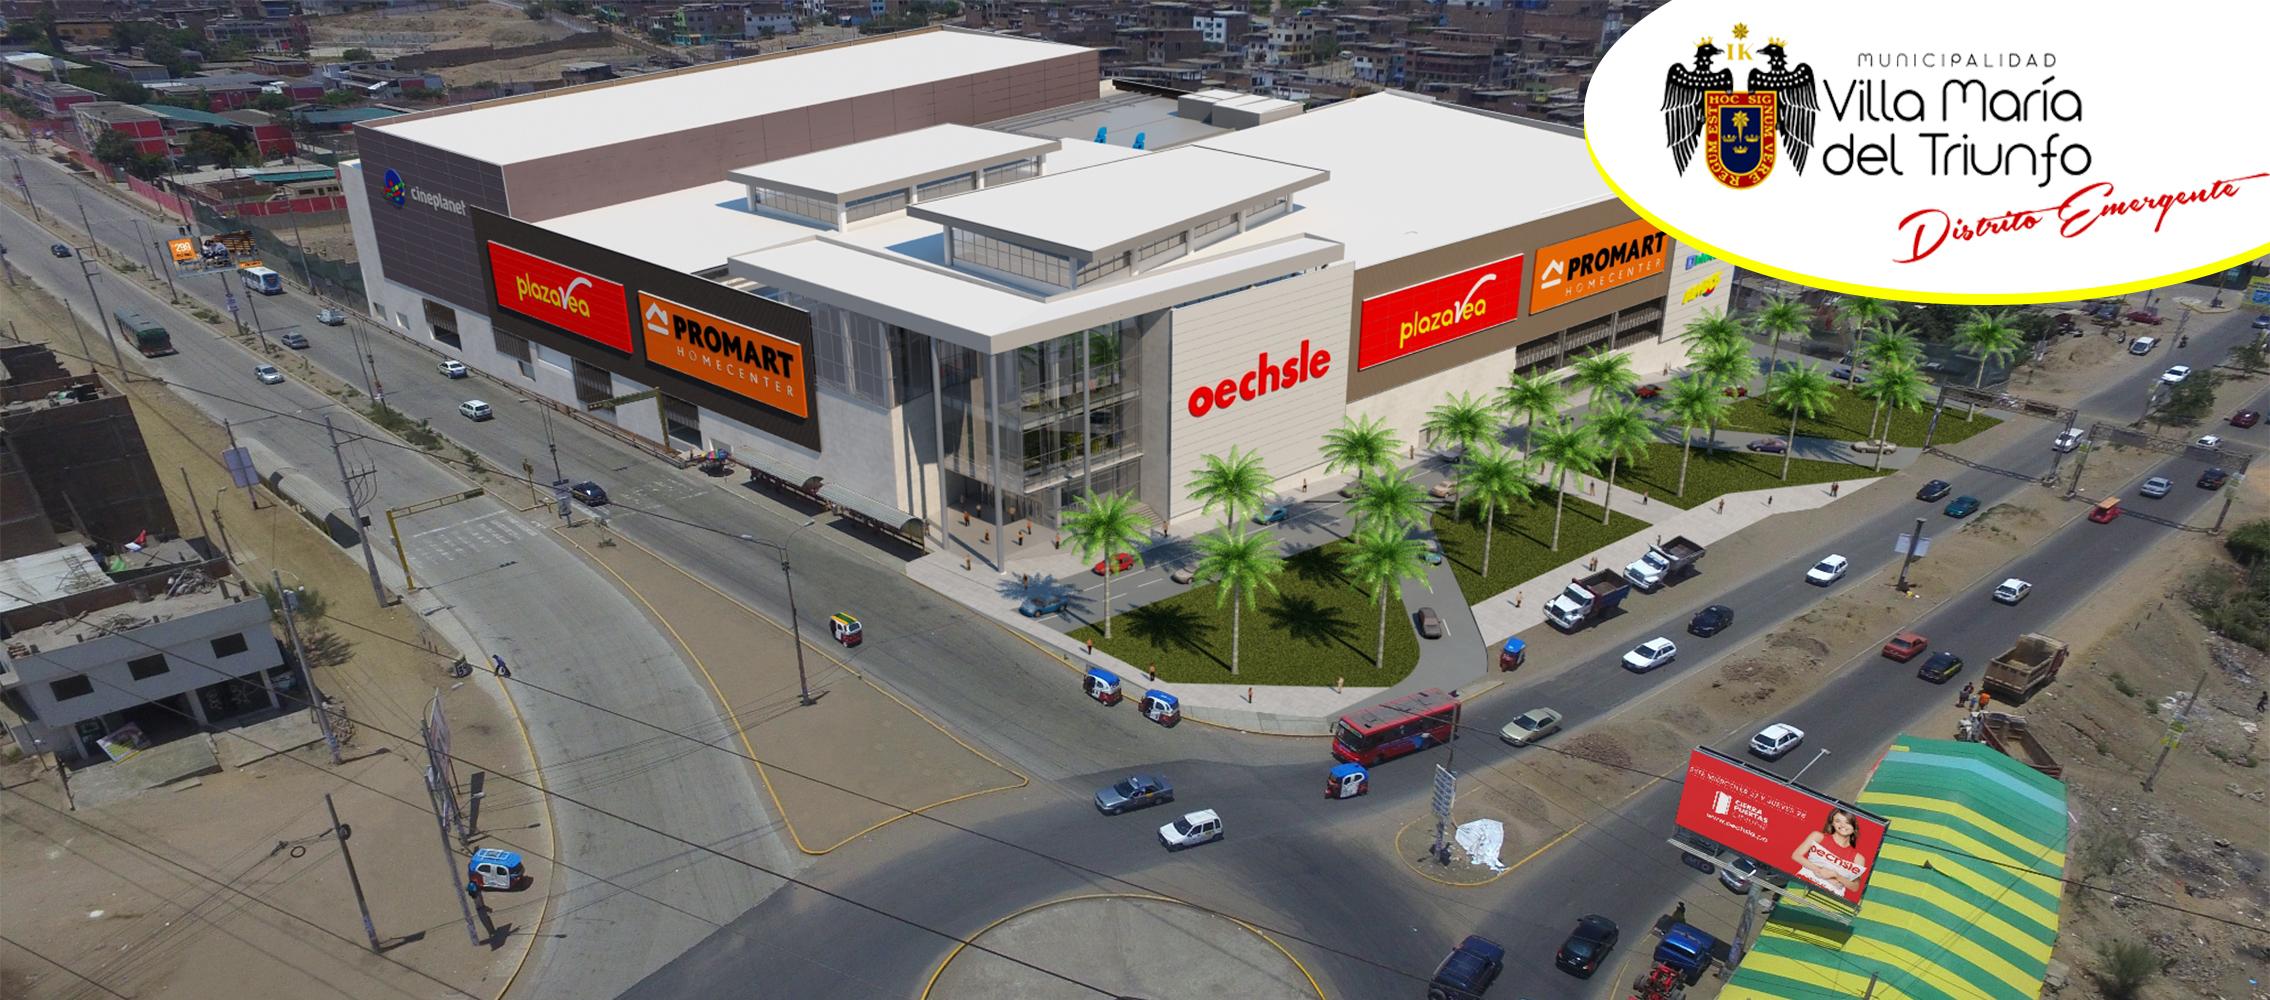 real-plaza-mall-vmt-2